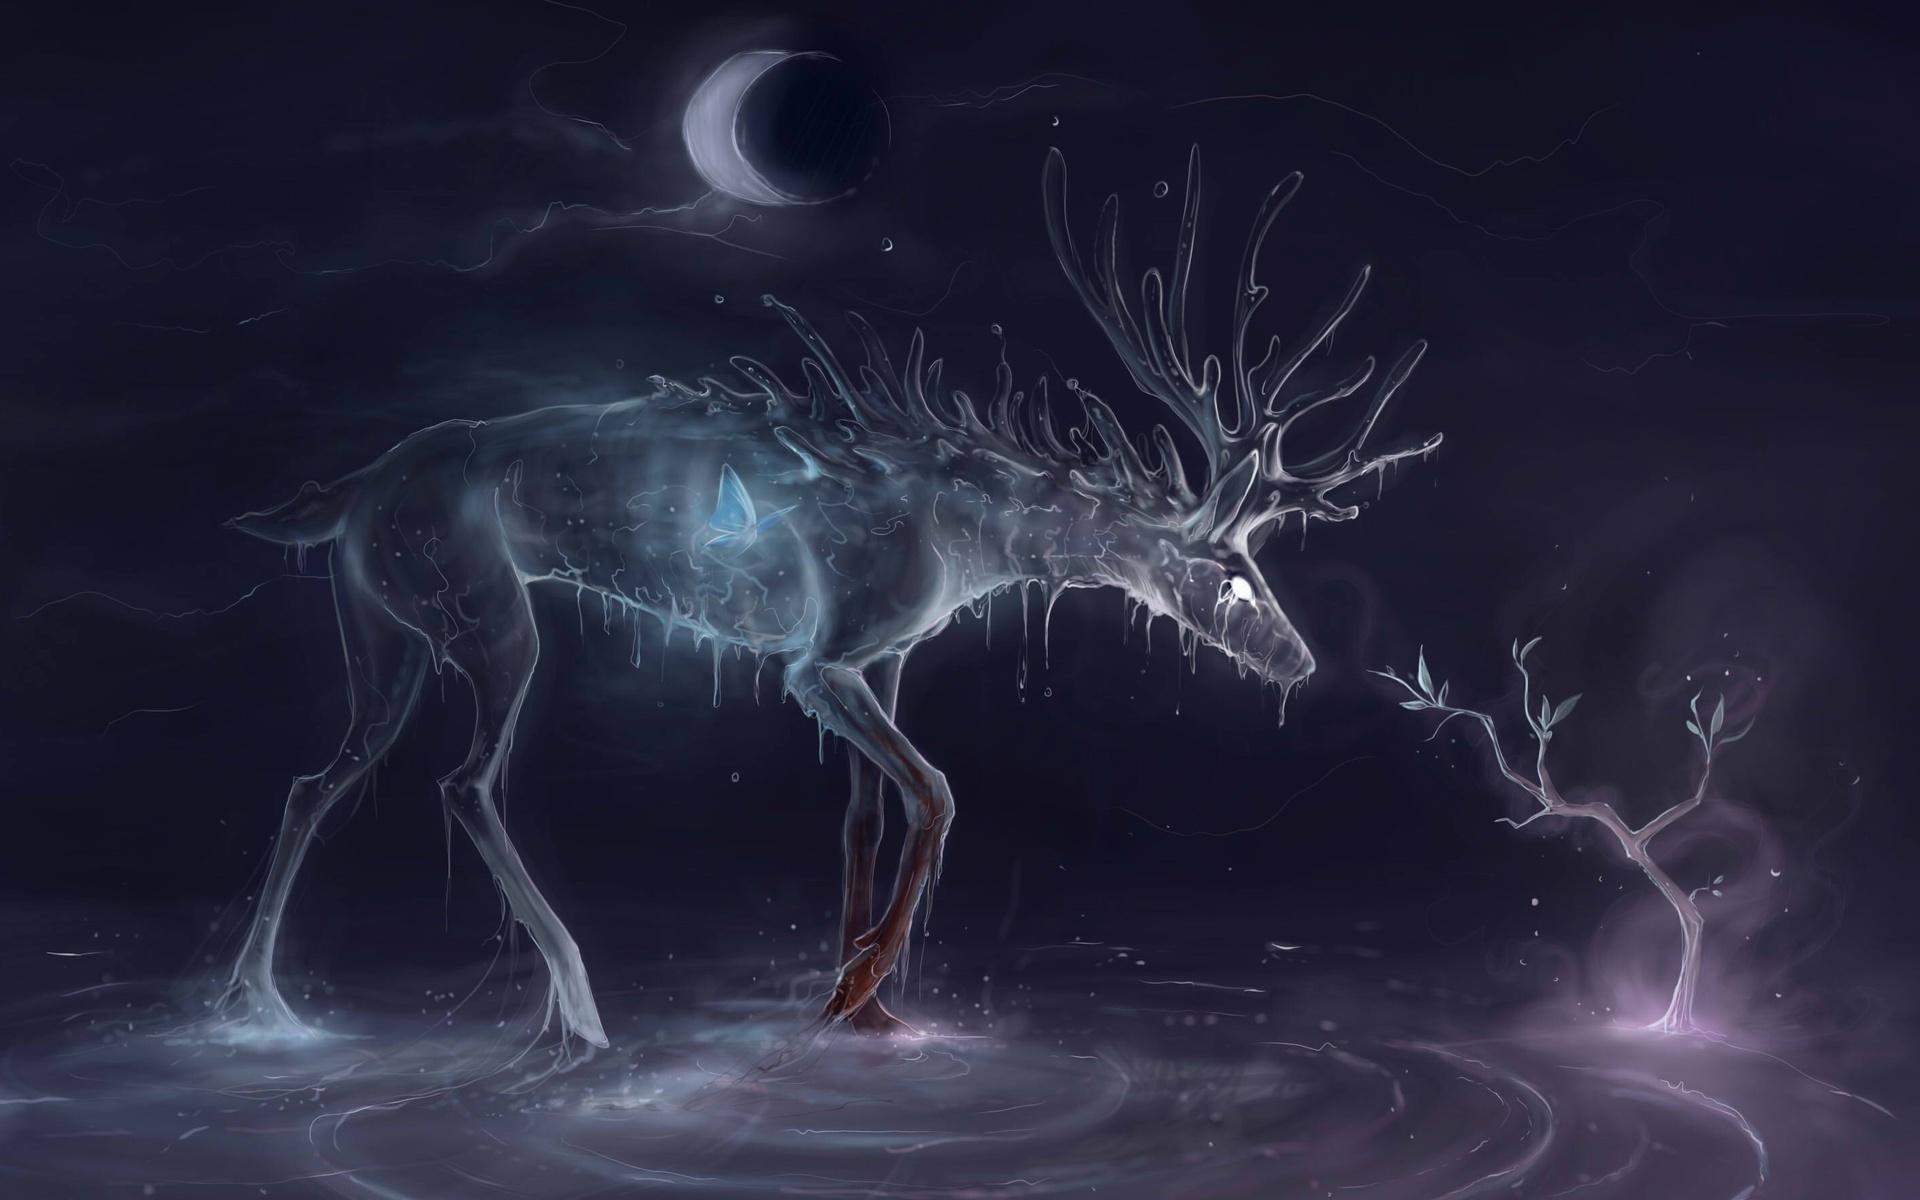 Fantasy magic gothic deer animals wallpaper | 1920x1200 | 28607 ...